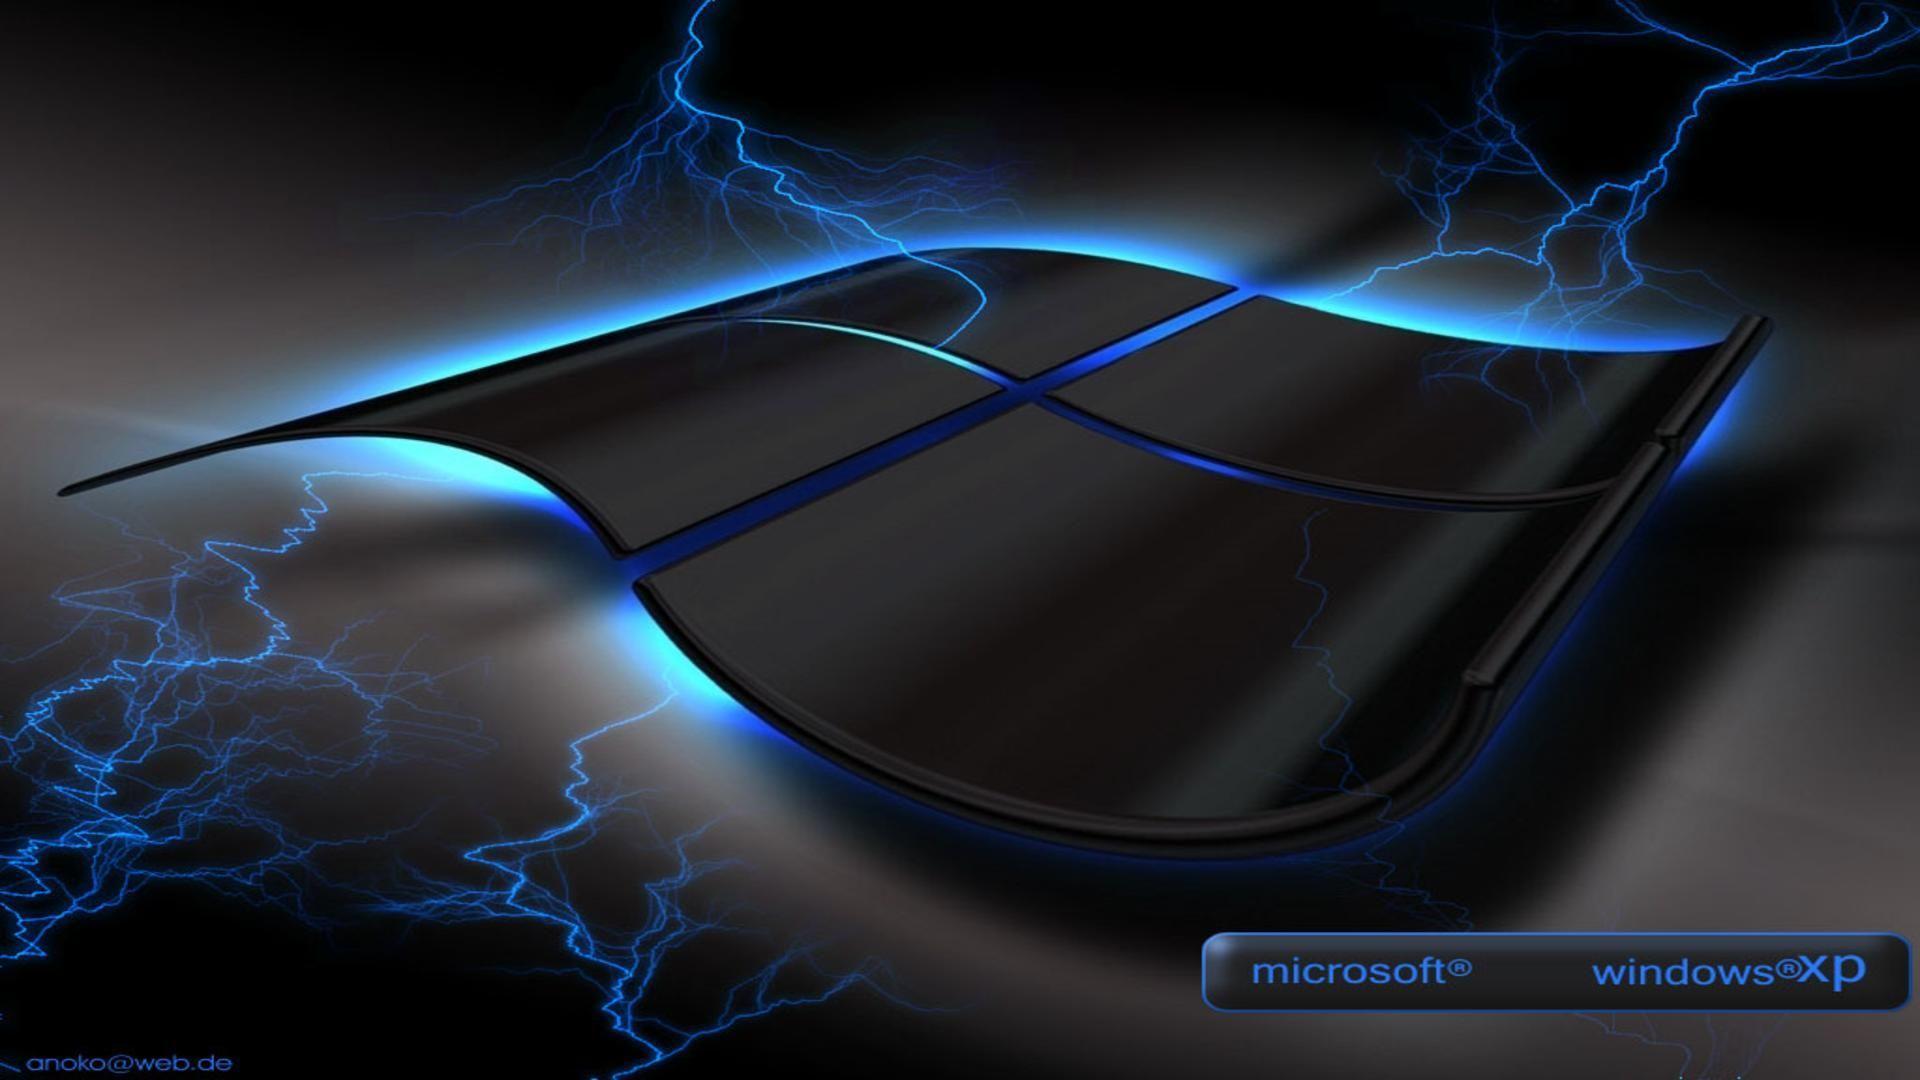 Windows XP Desktop Backgrounds 033